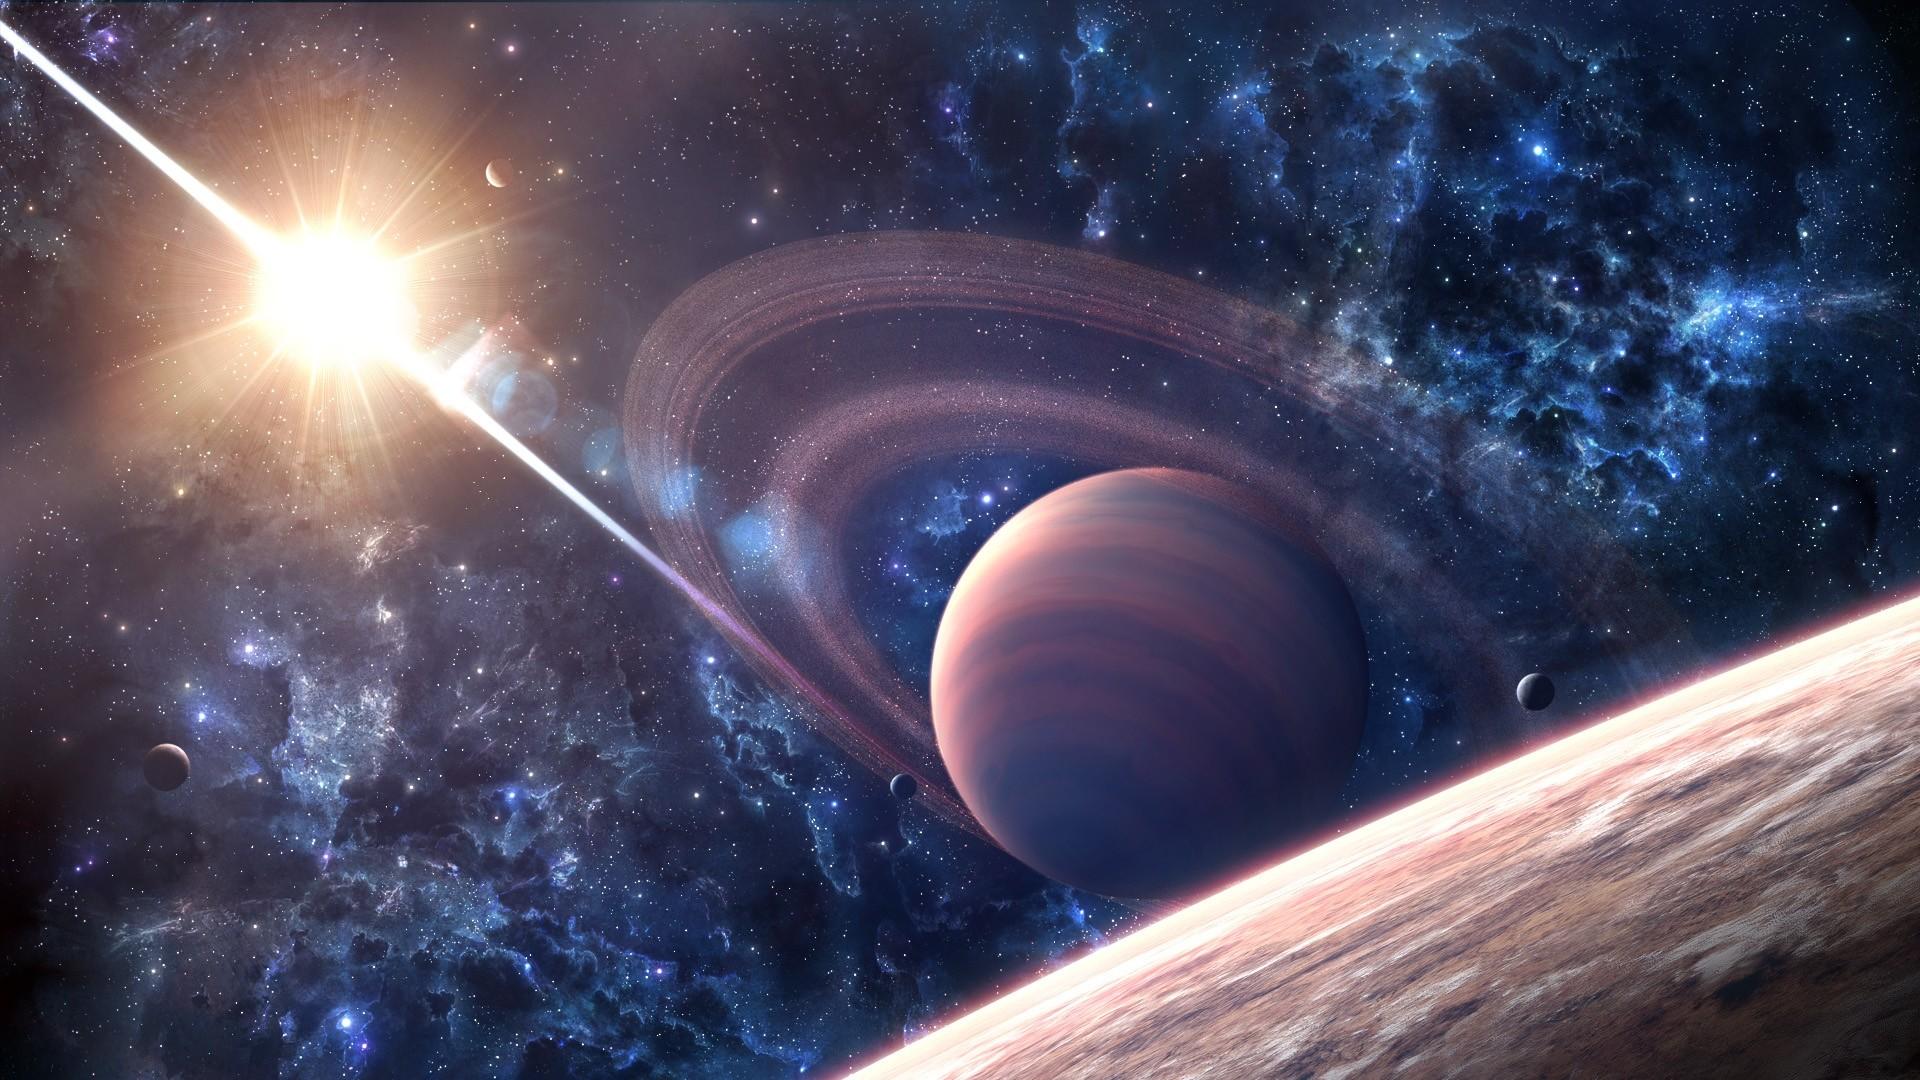 Wallpaper space, galaxy, saturn, planet